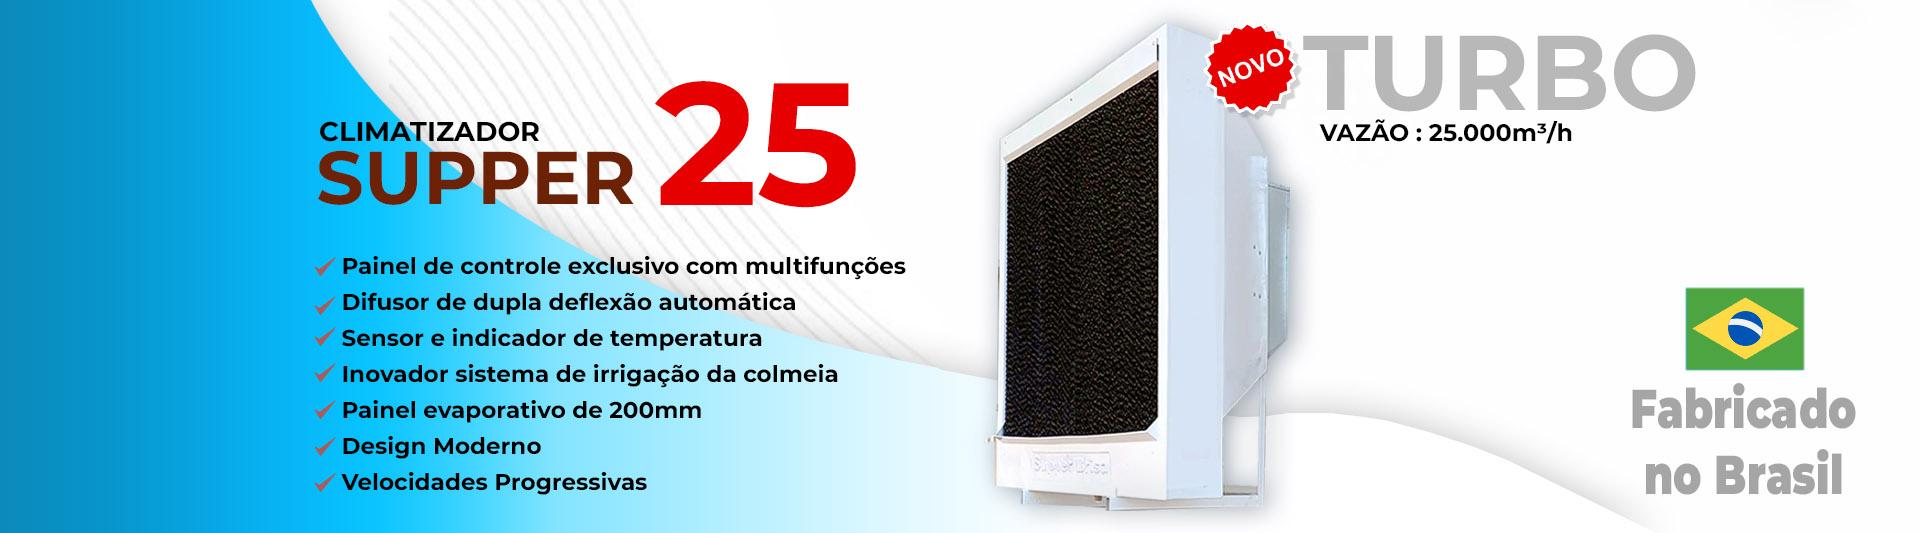 climatizador industrial evaporativo Supper Brisa Climatizadores Climatizacao banner agenciatem goiania 2